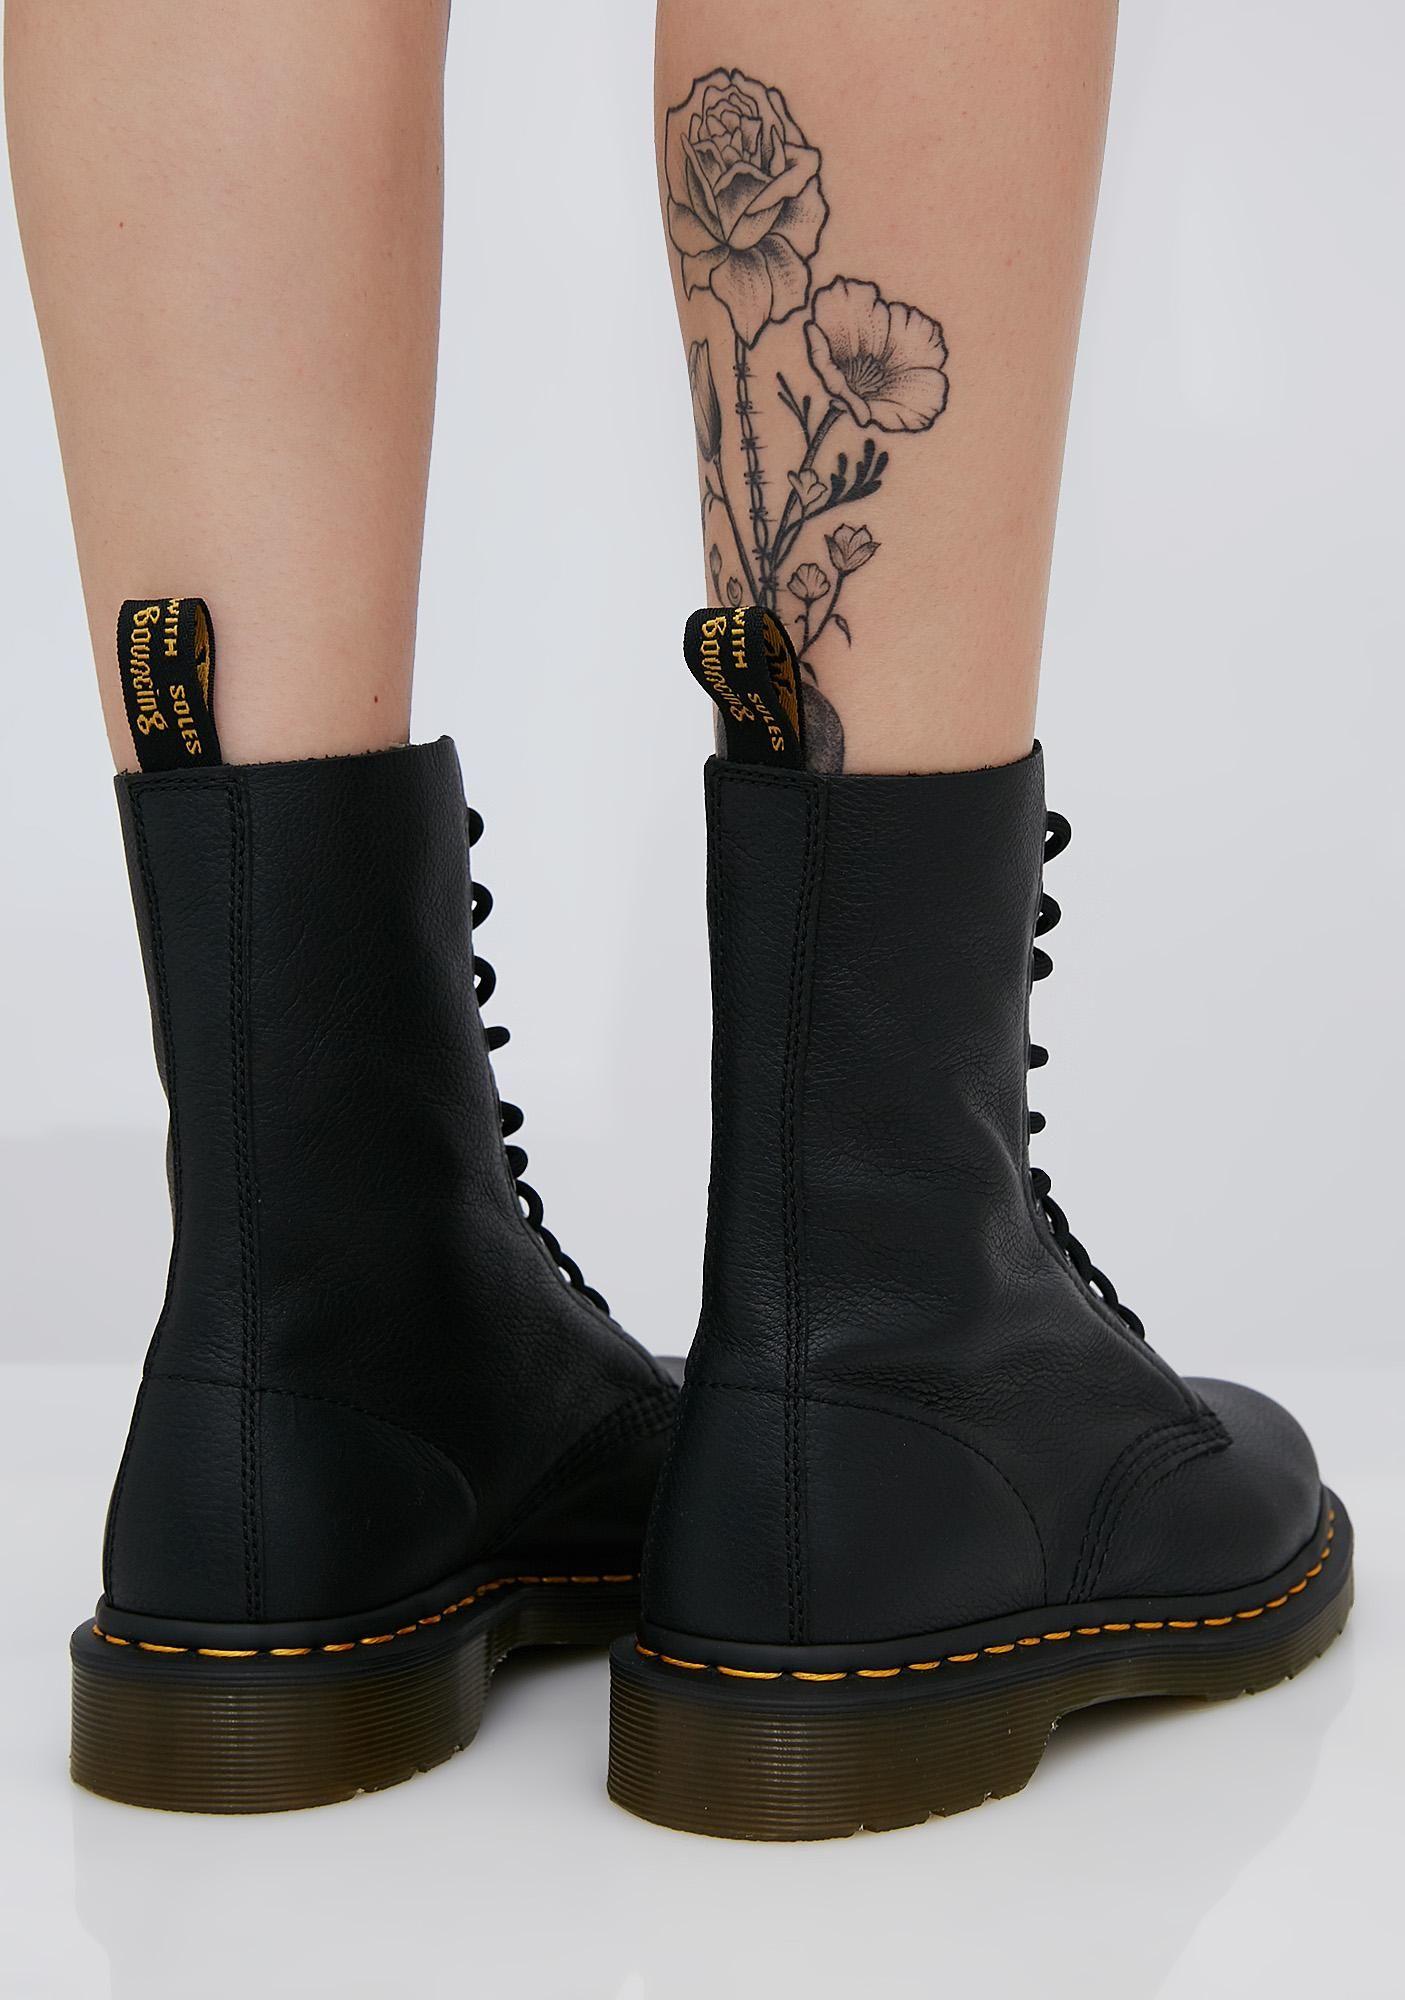 be27e242c082 Dr. Martens 1490 Virginia Boots